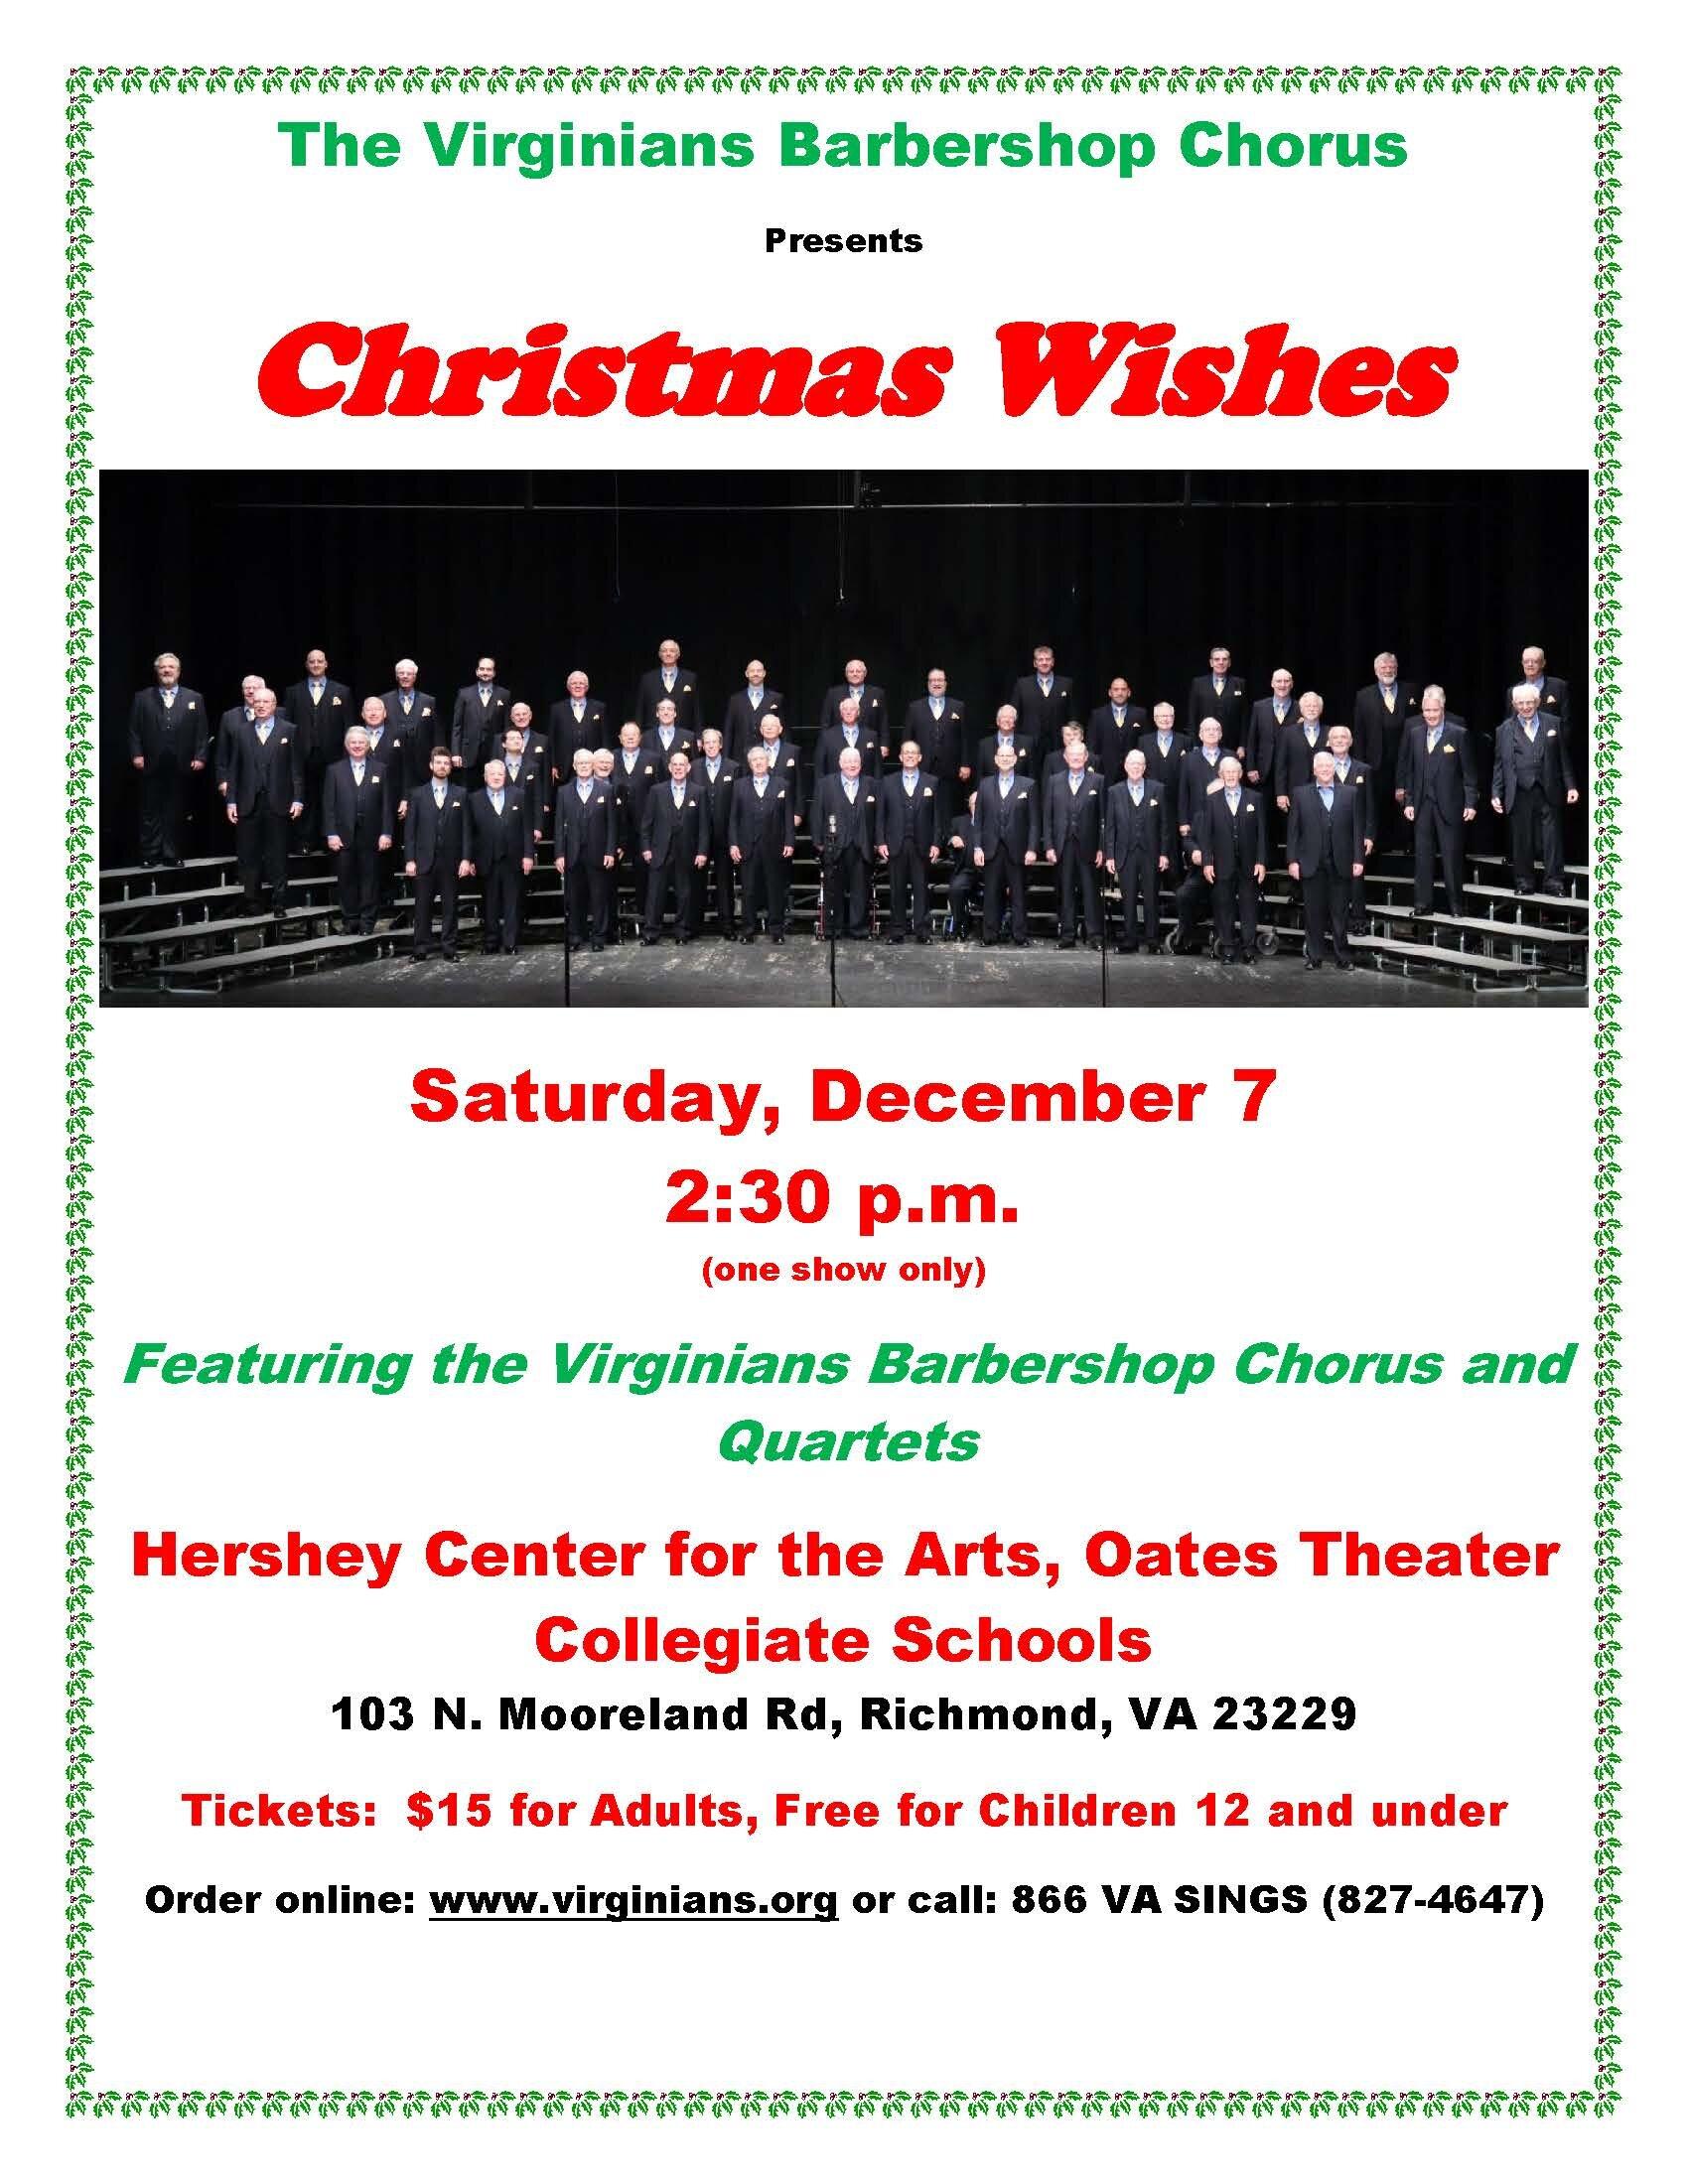 Christmas show flyer 1.jpg